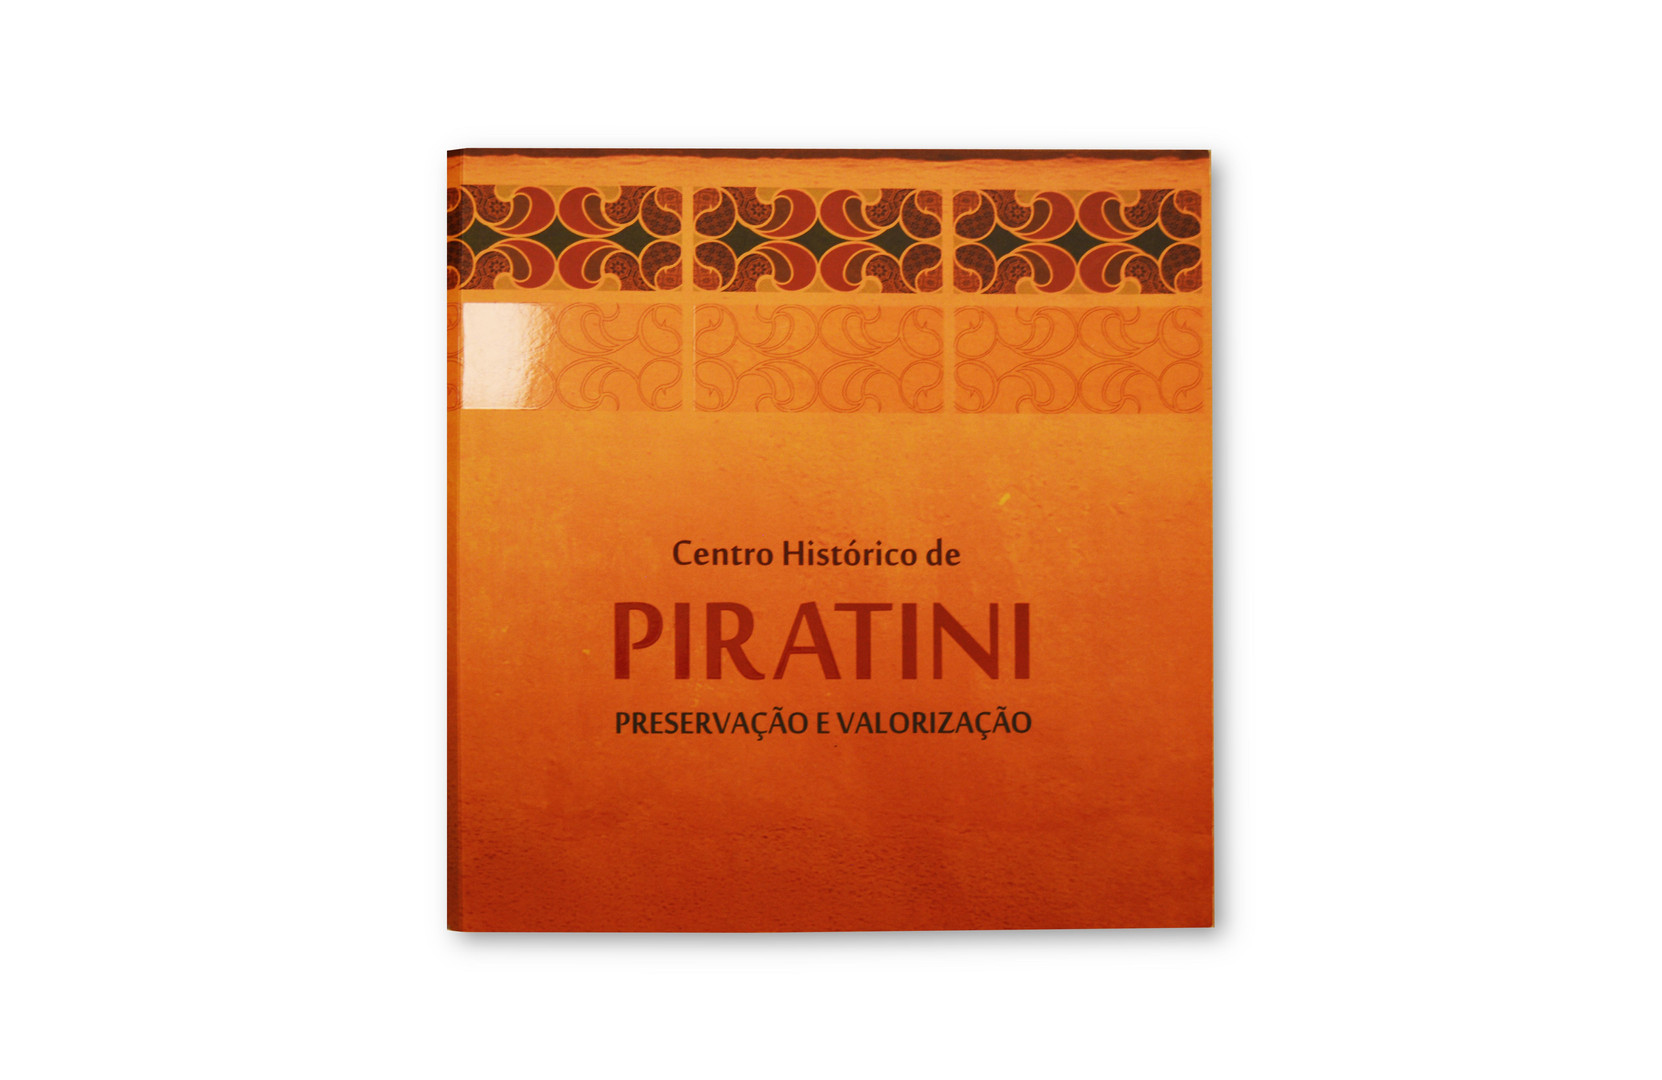 piratini_capa.jpg